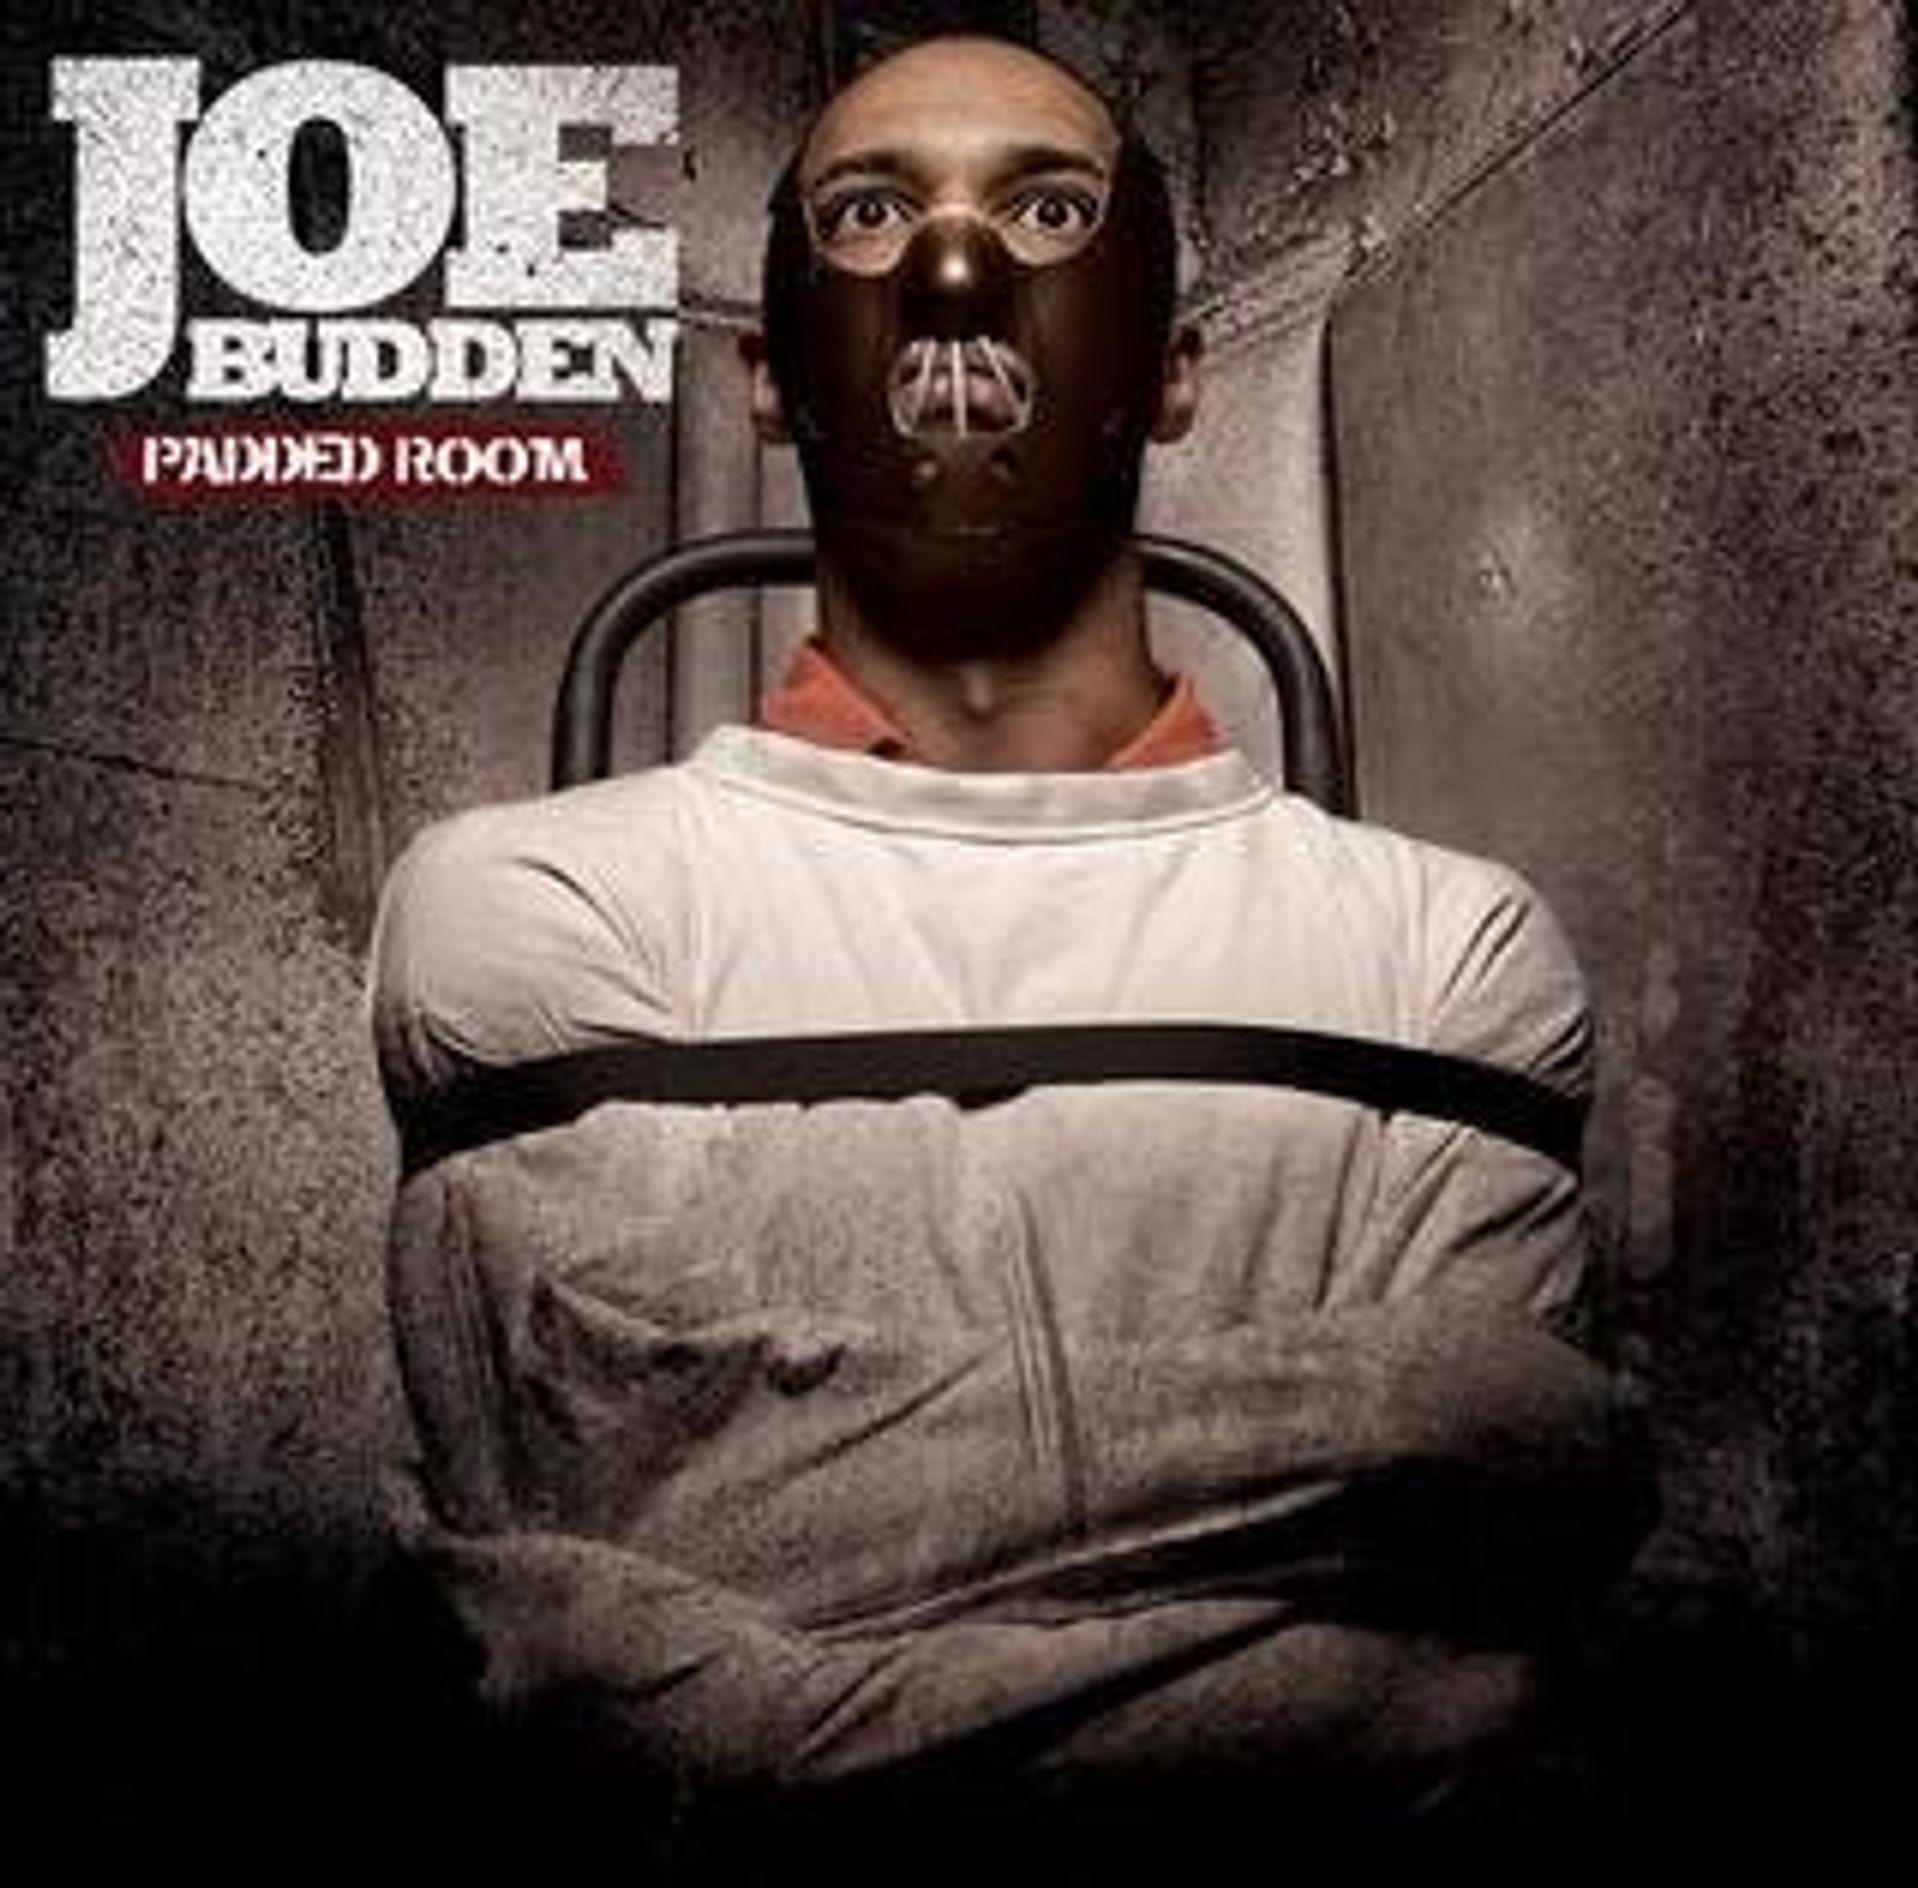 Album Title: Padded Room by: Joe Budden